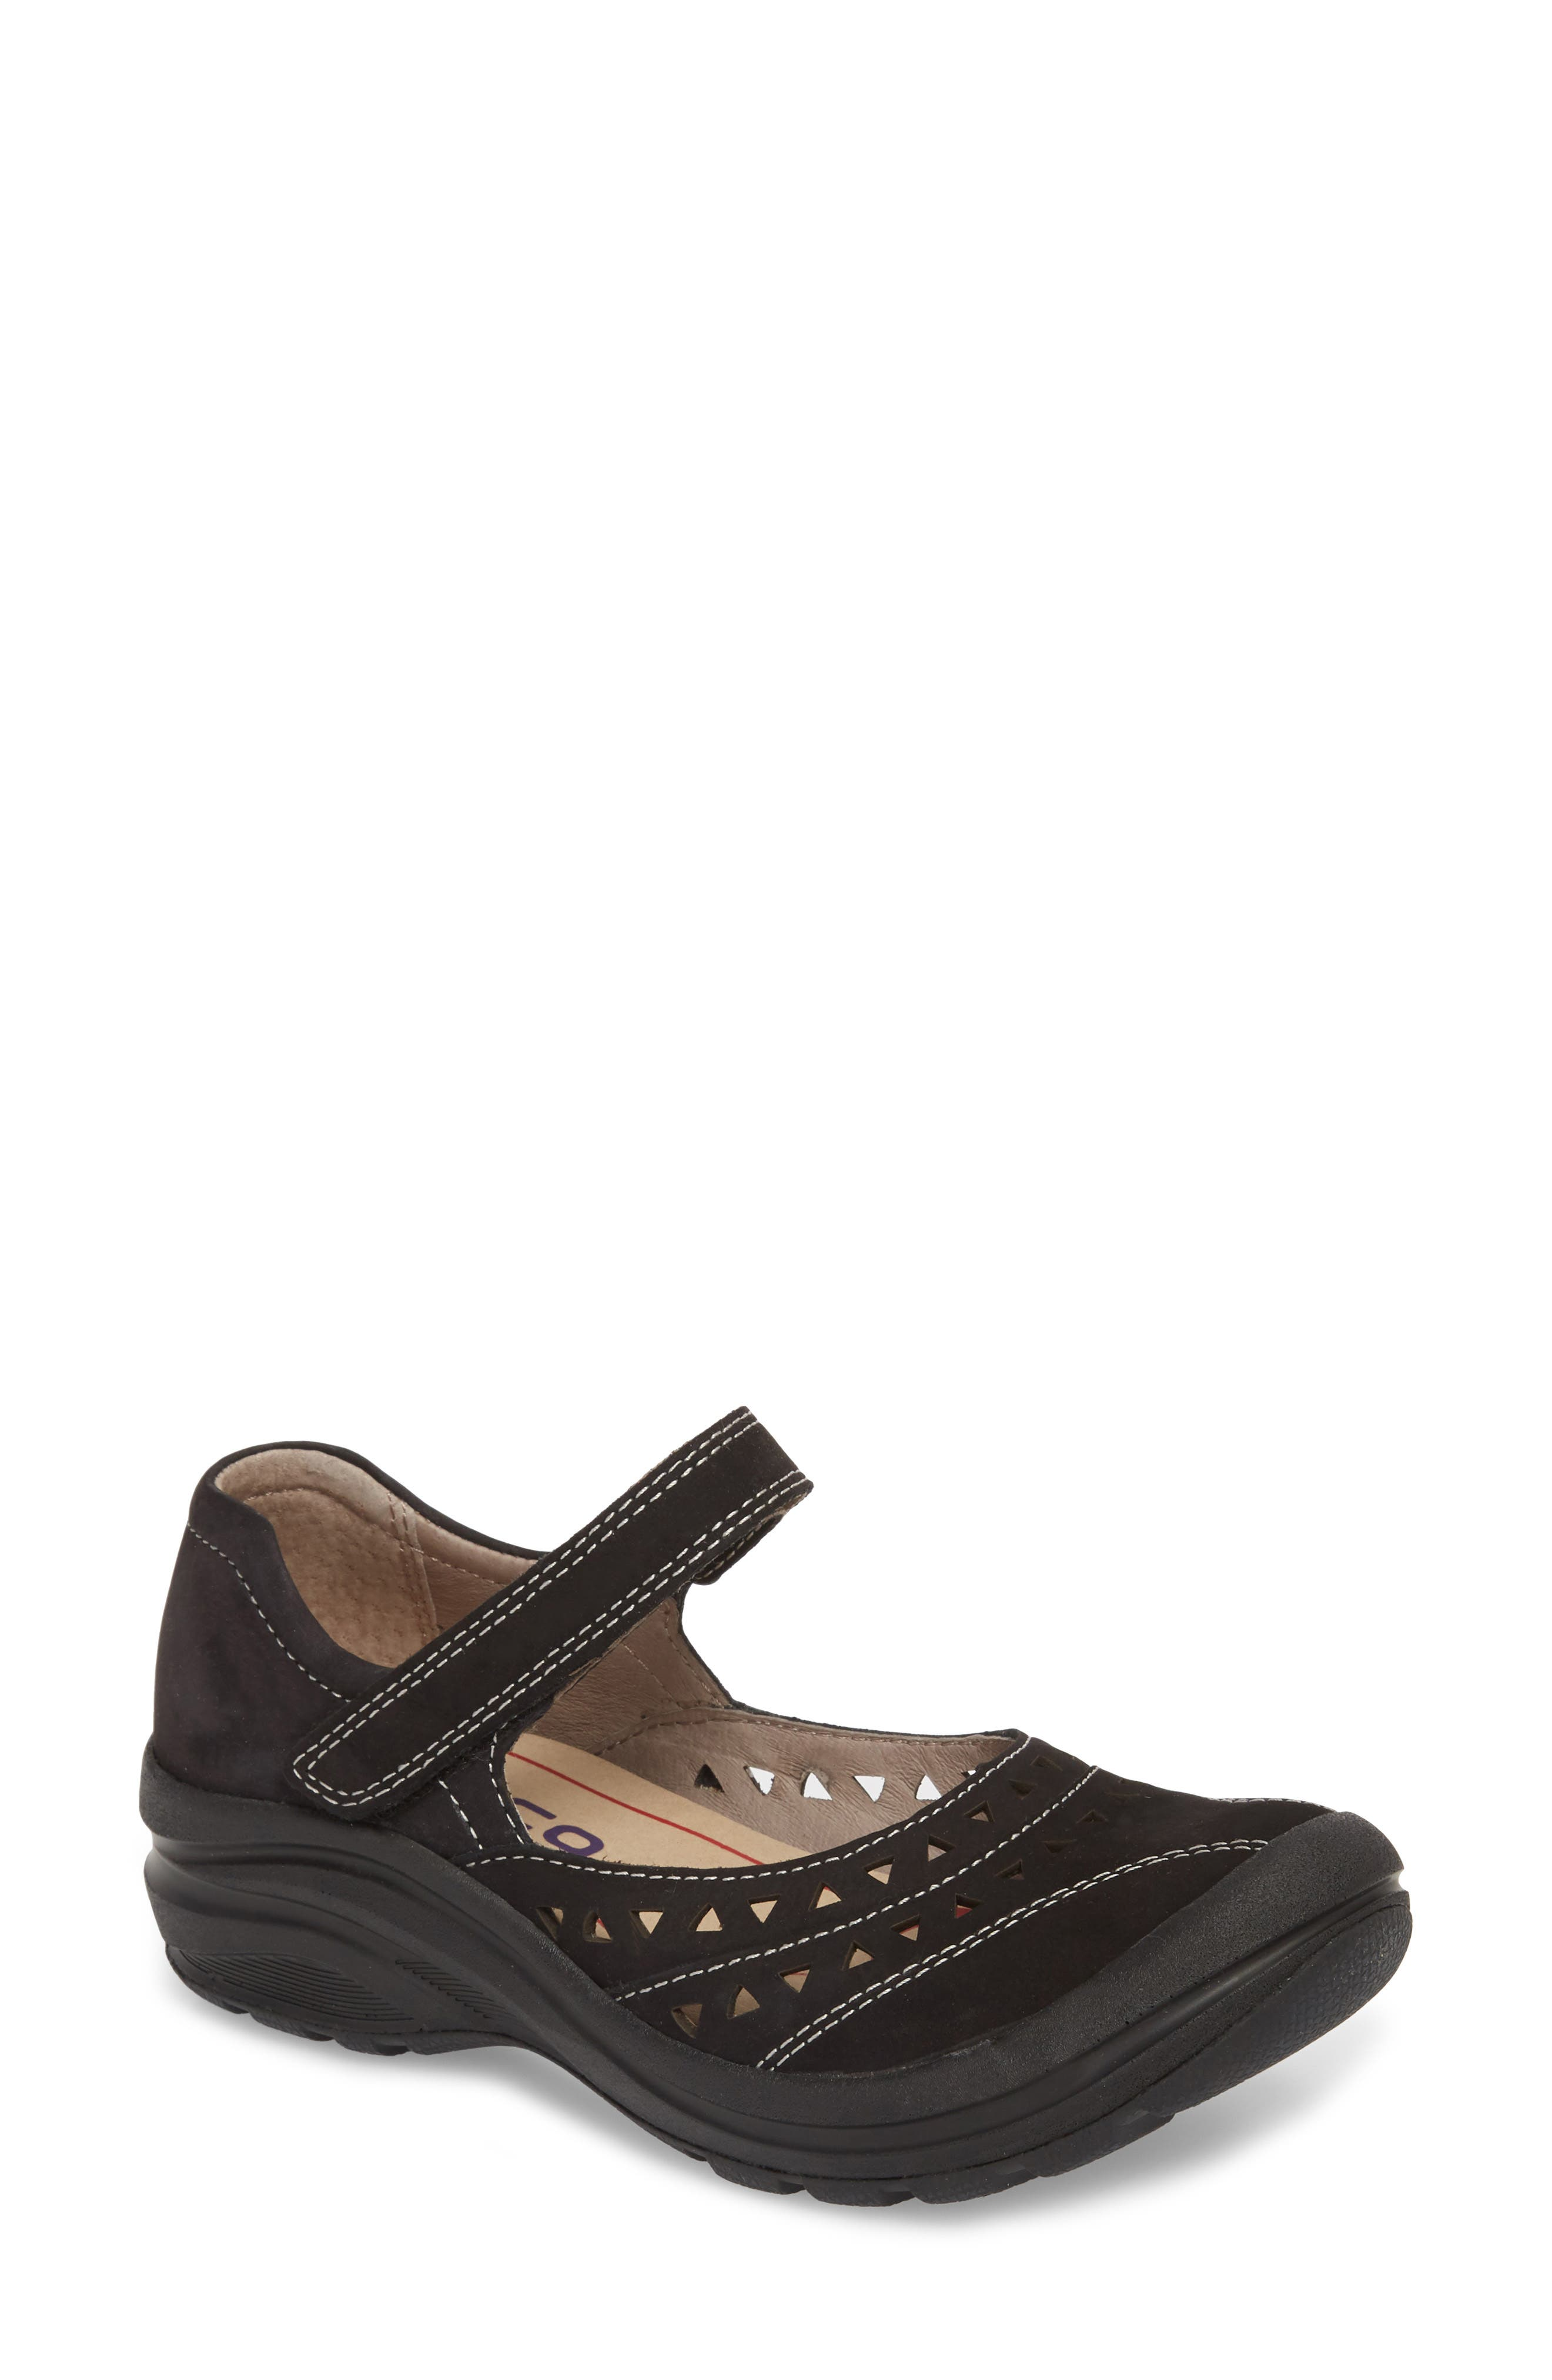 BIONICA,                             Matia Mary Jane Sneaker,                             Main thumbnail 1, color,                             BLACK LEATHER